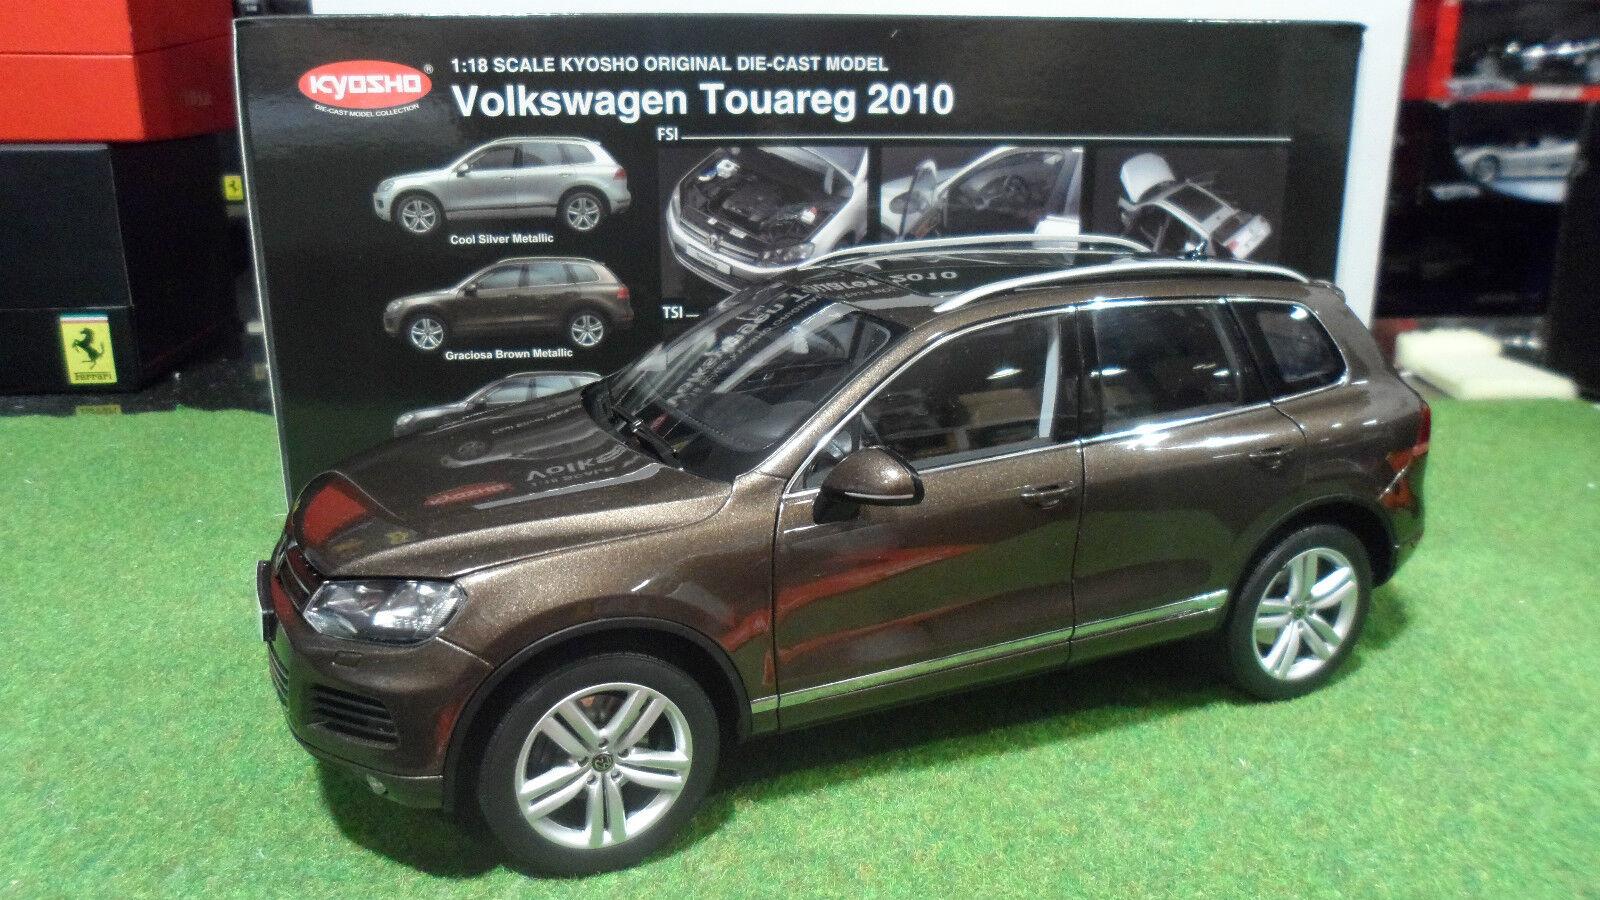 VOLKSWAGEN TOUAREG 2010 FSI marron au 1 18  KYOSHO 08821GBR voiture miniature